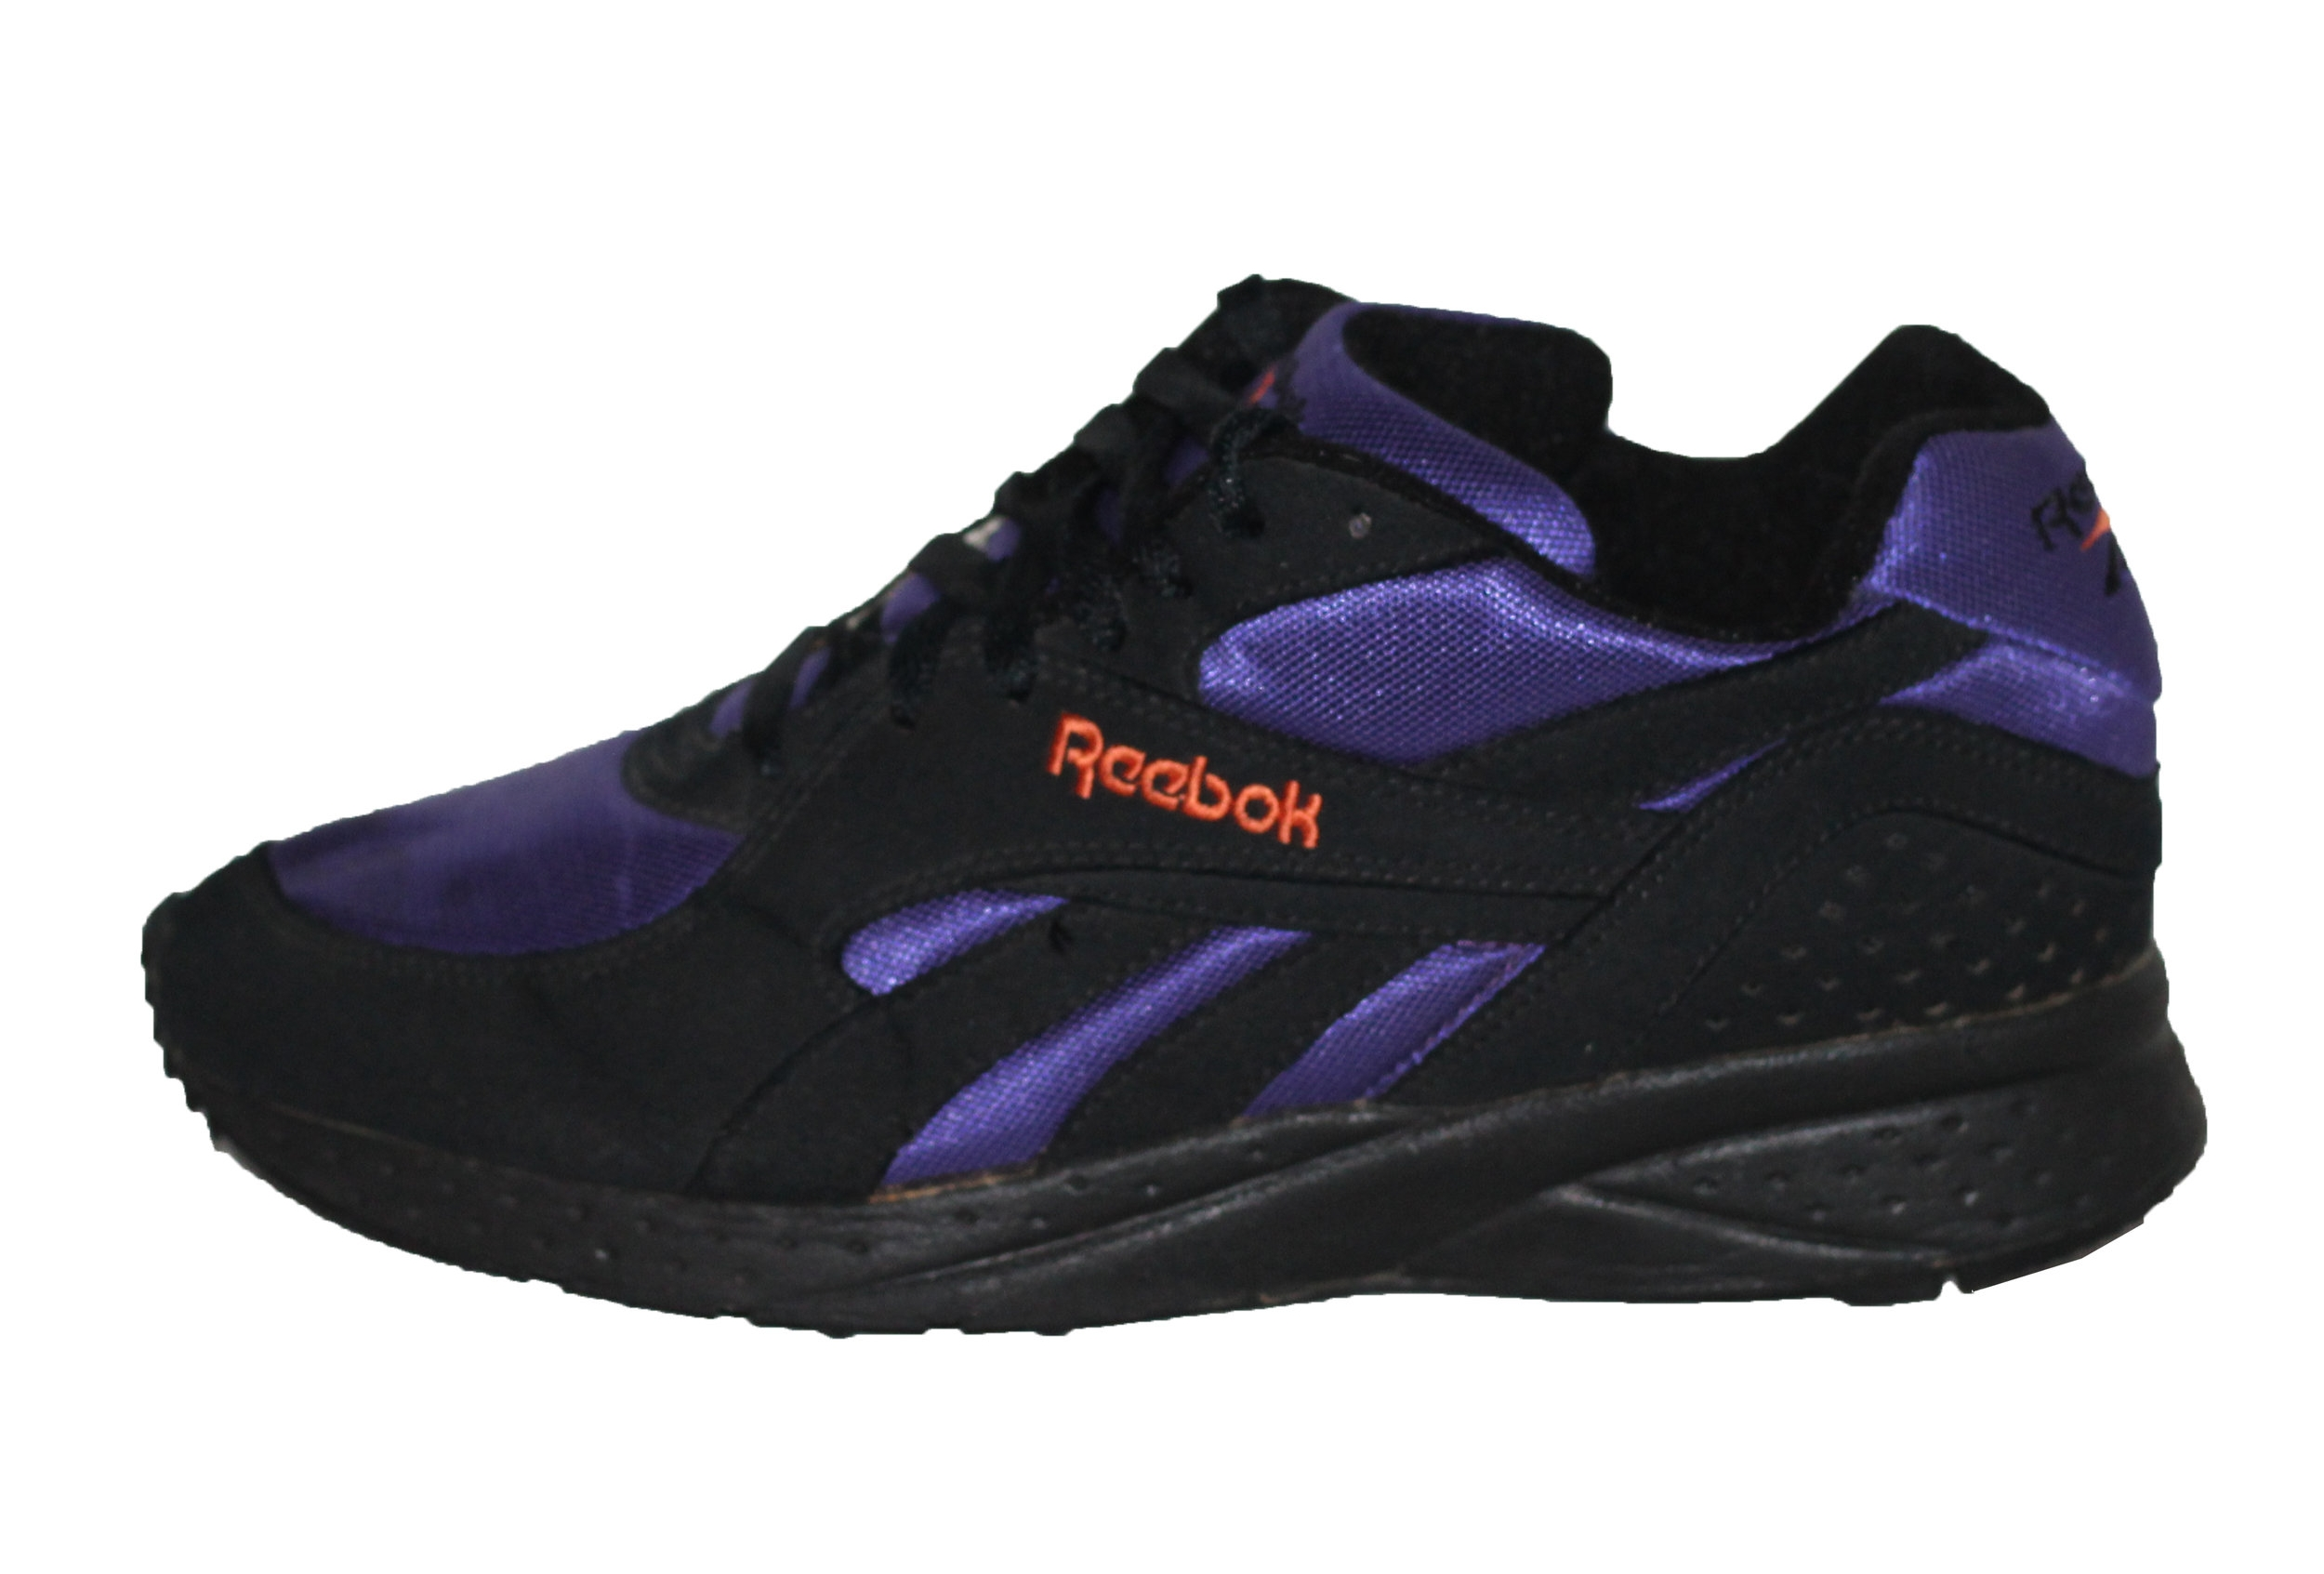 Vintage Reebok Hexalite Black / Purple